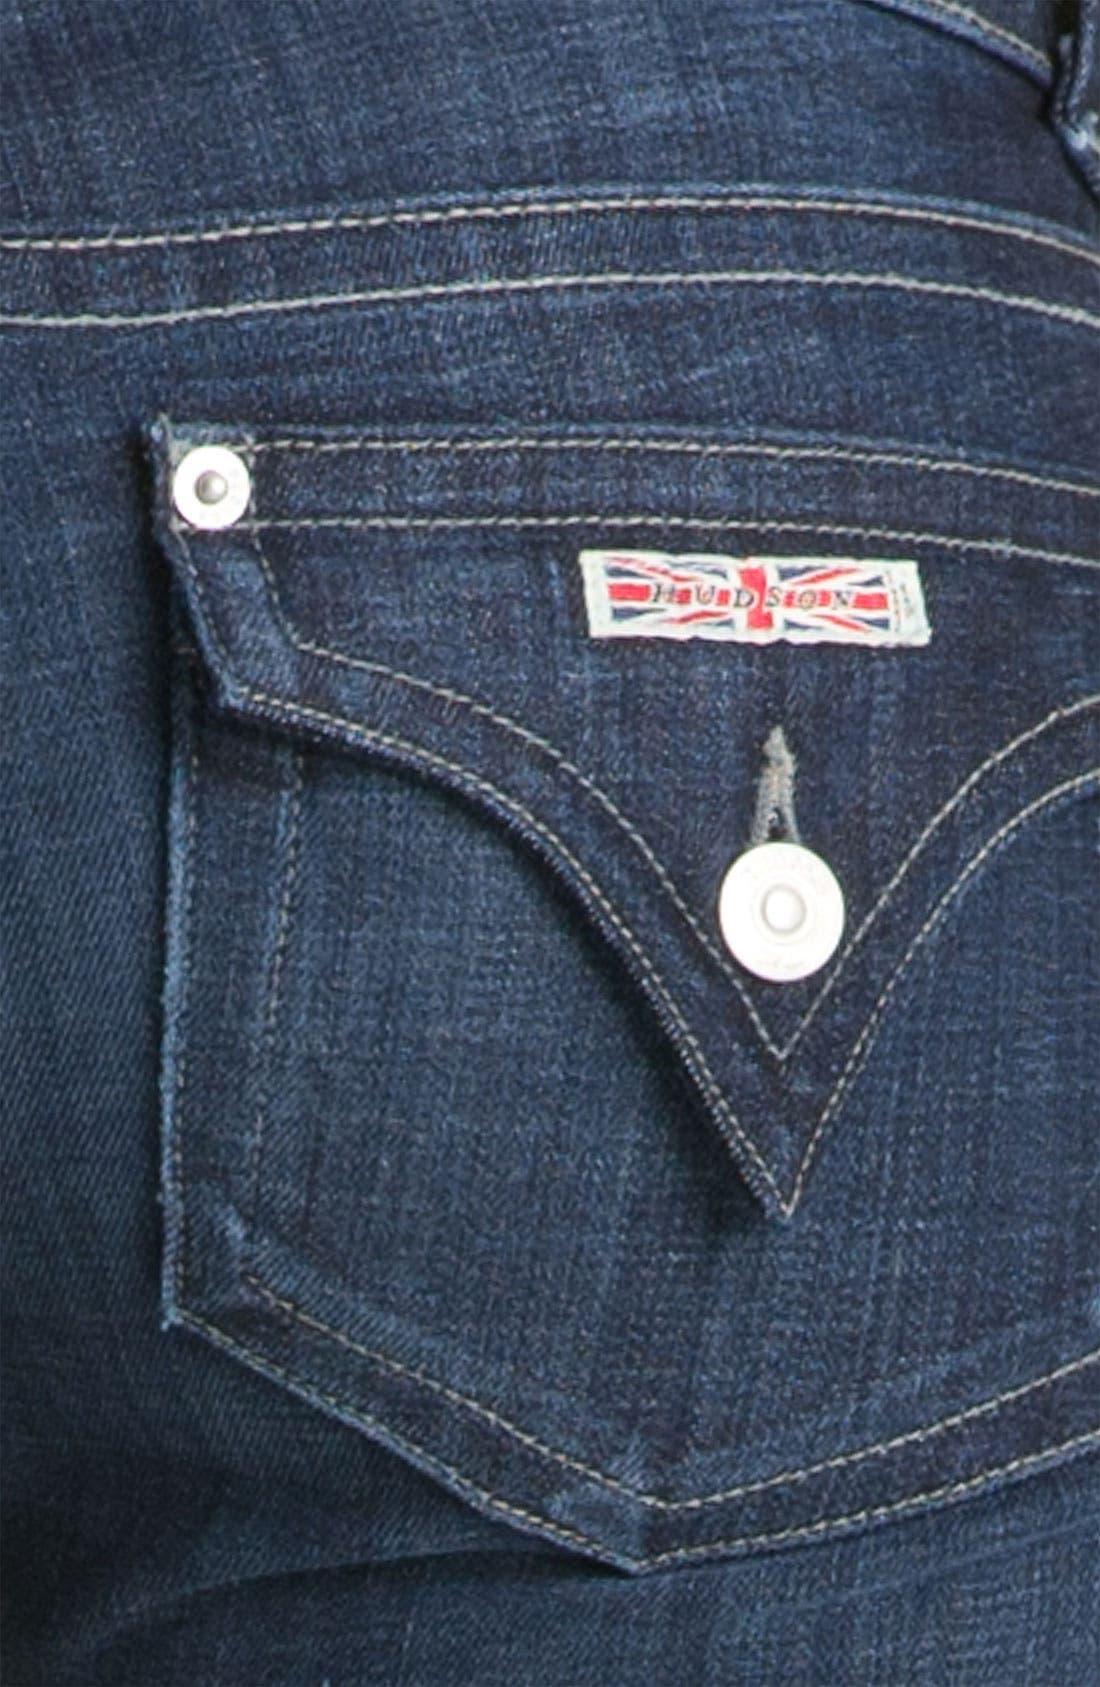 Alternate Image 3  - Hudson Jeans Signature Flap Pocket Bootcut Jeans (Bowery)